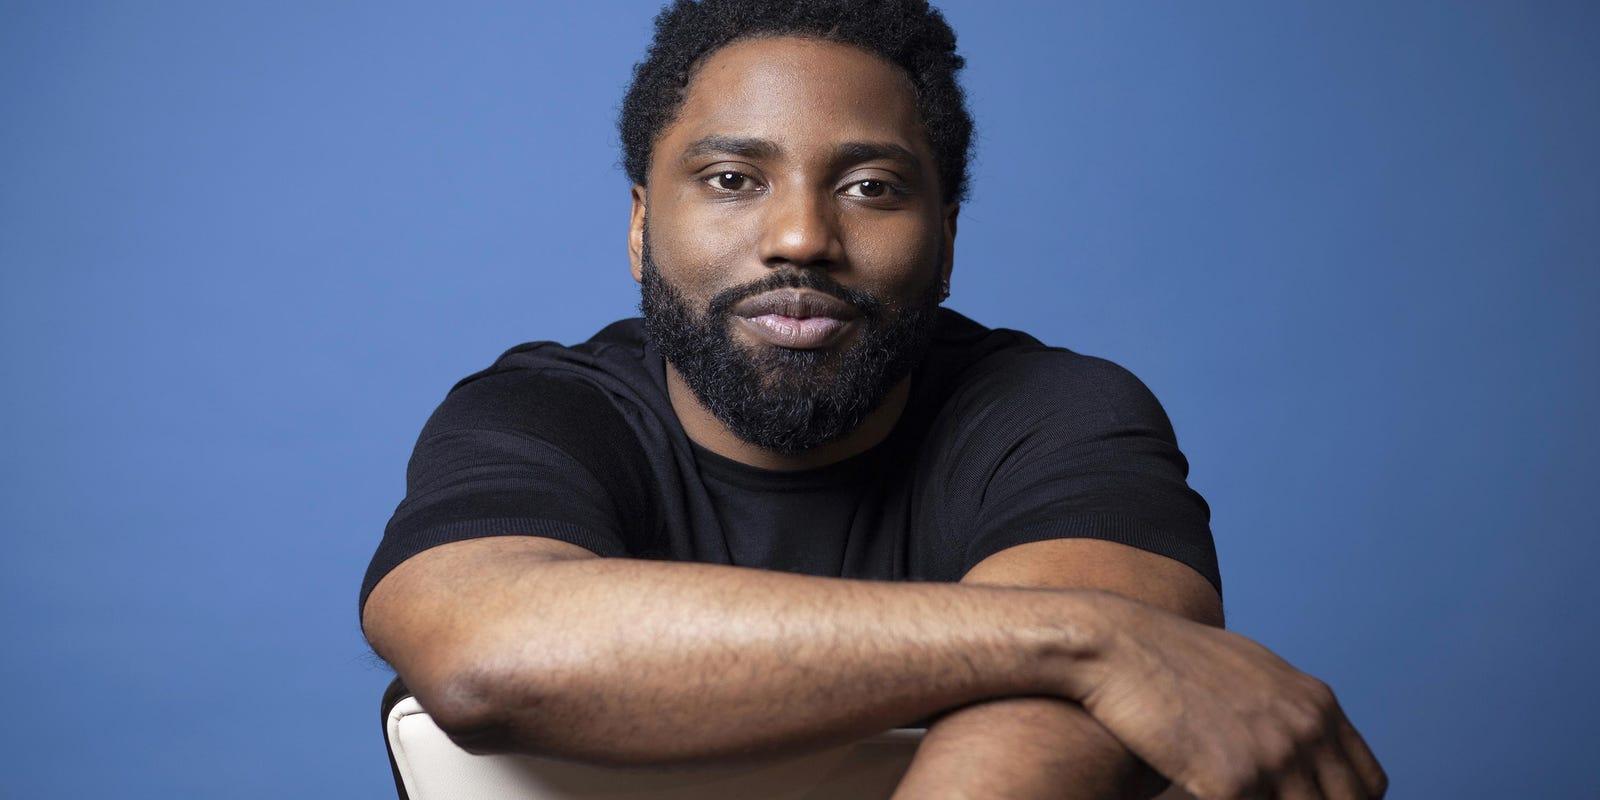 John David Washington creates own lane with Oscar buzz